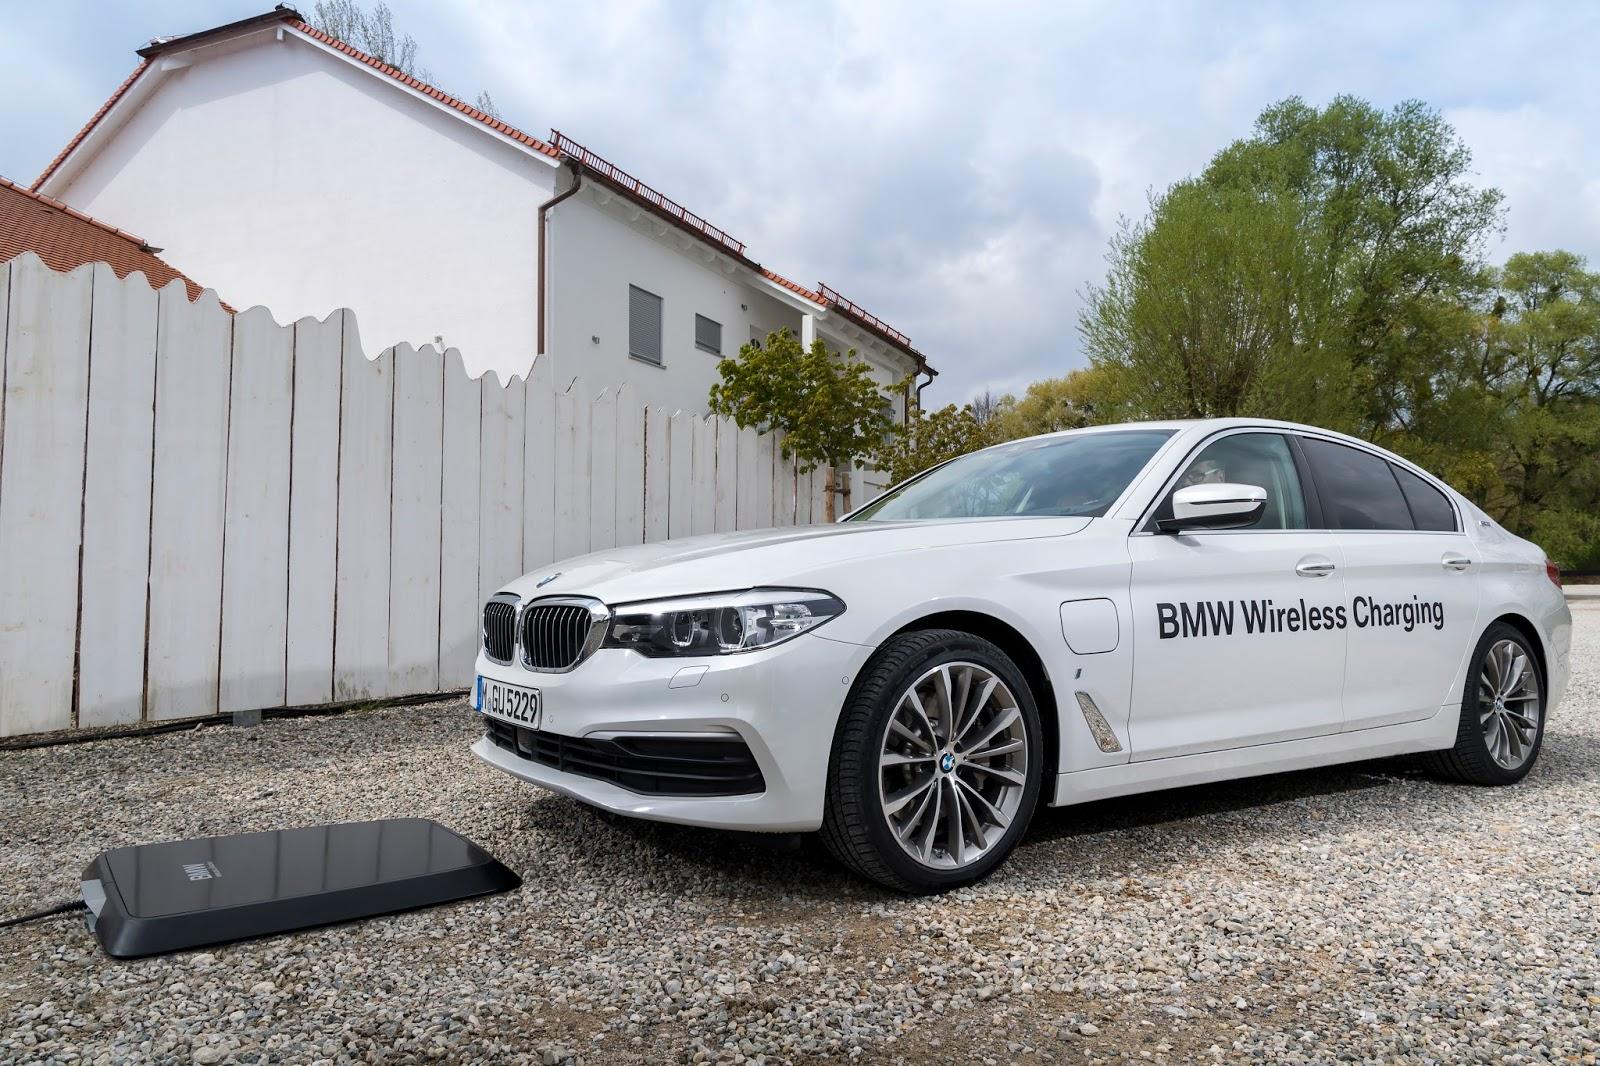 P90256388 highRes bmw wireless chargin Η BMW 530e iPerformance φέρνει την ηλεκτρική επανάσταση BMW, BMW 5, BMW 530e iPerformance, Electric cars, Hybrid, Λανσάρισμα